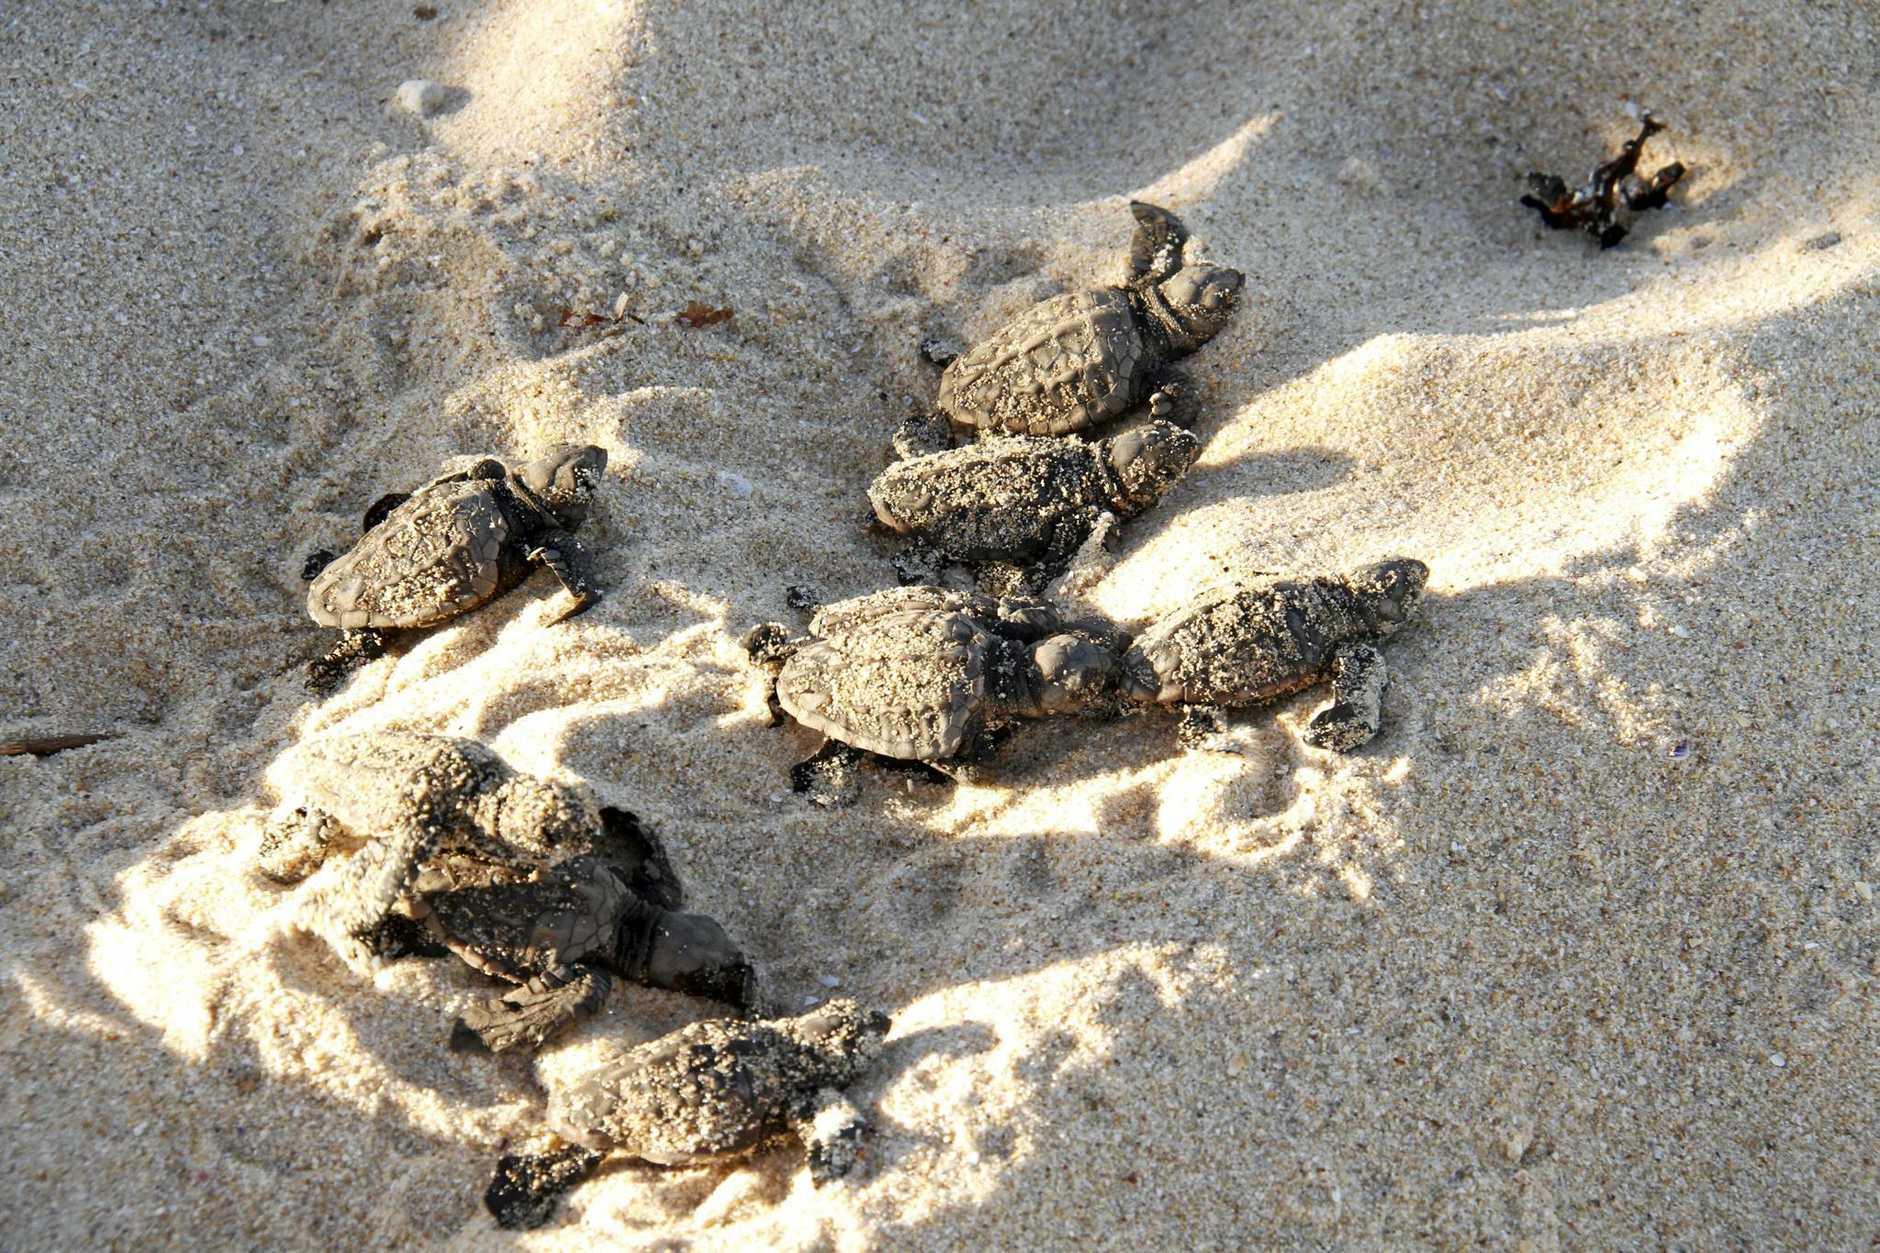 Turtle hatchlings on a Sunshine Coast beach.